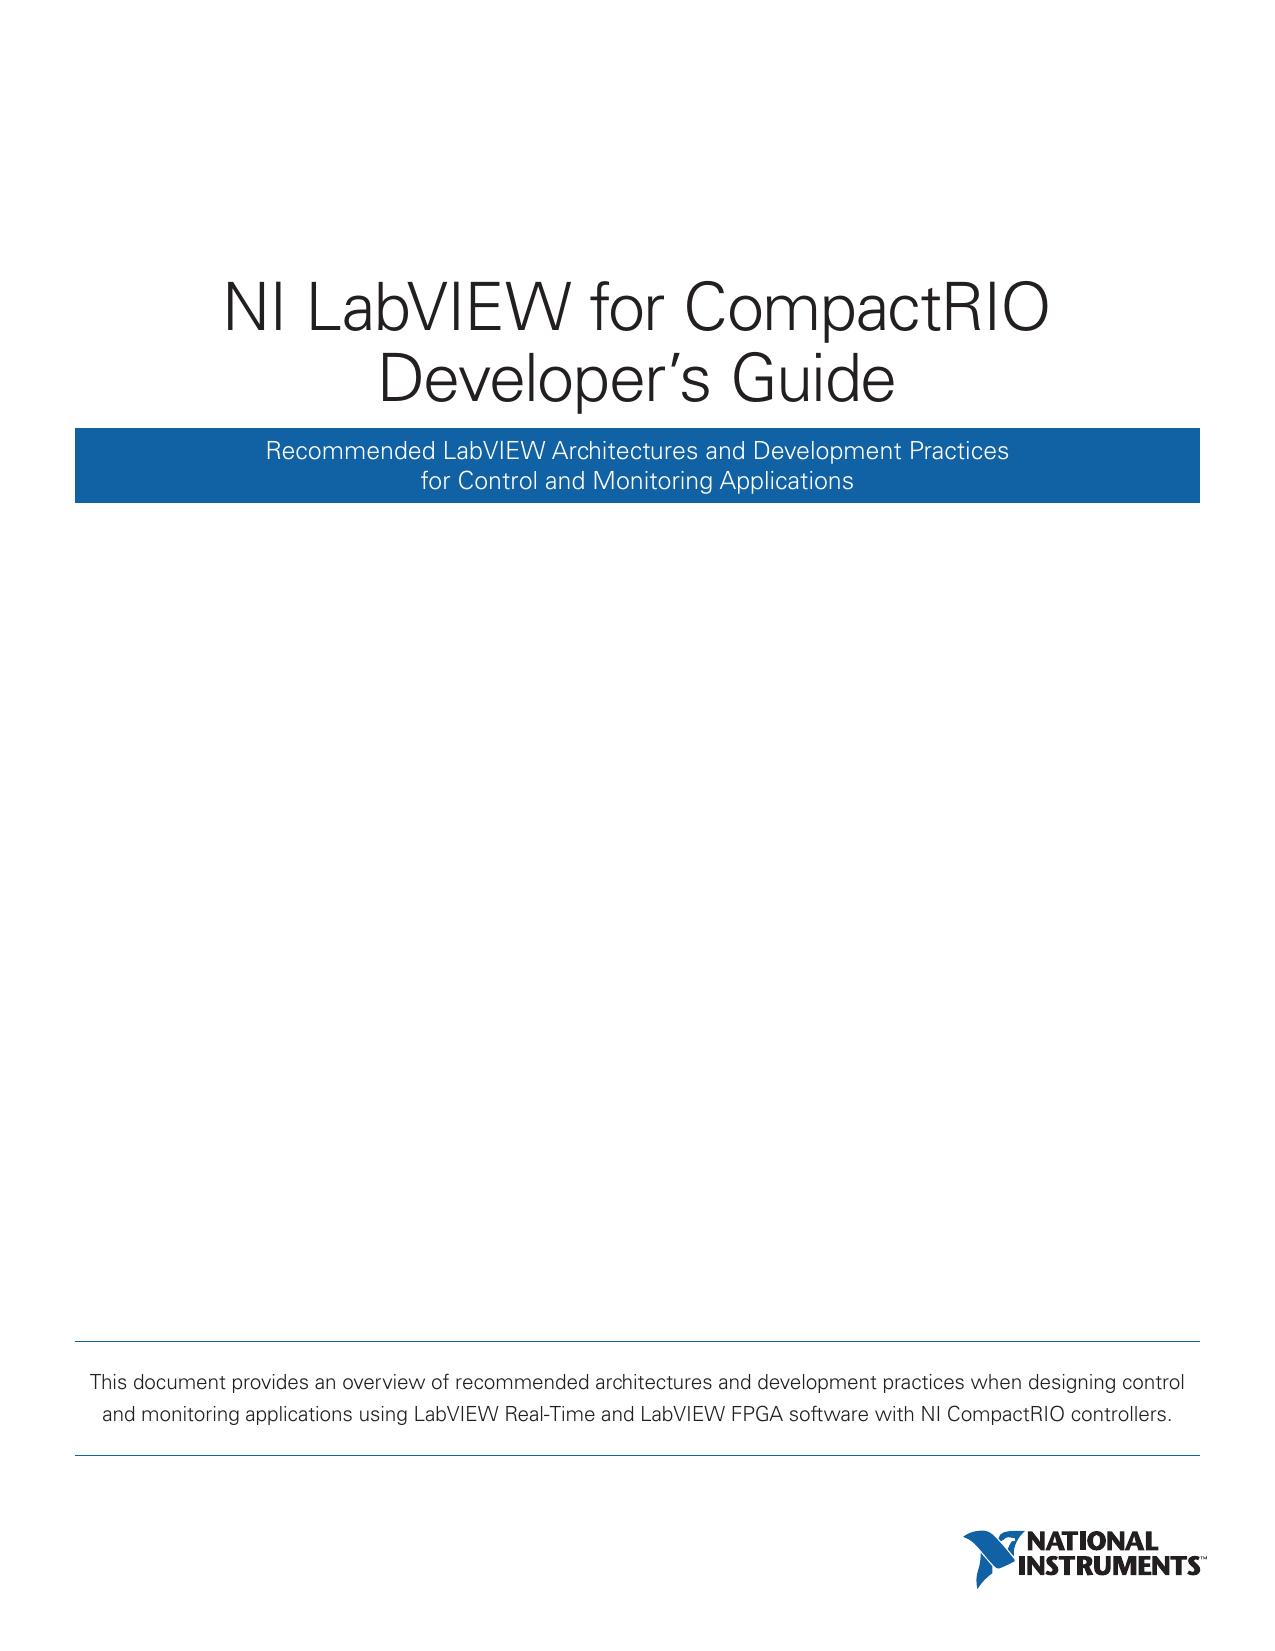 NI LabVIEW for CompactRIO Developer`s Guide | manualzz com